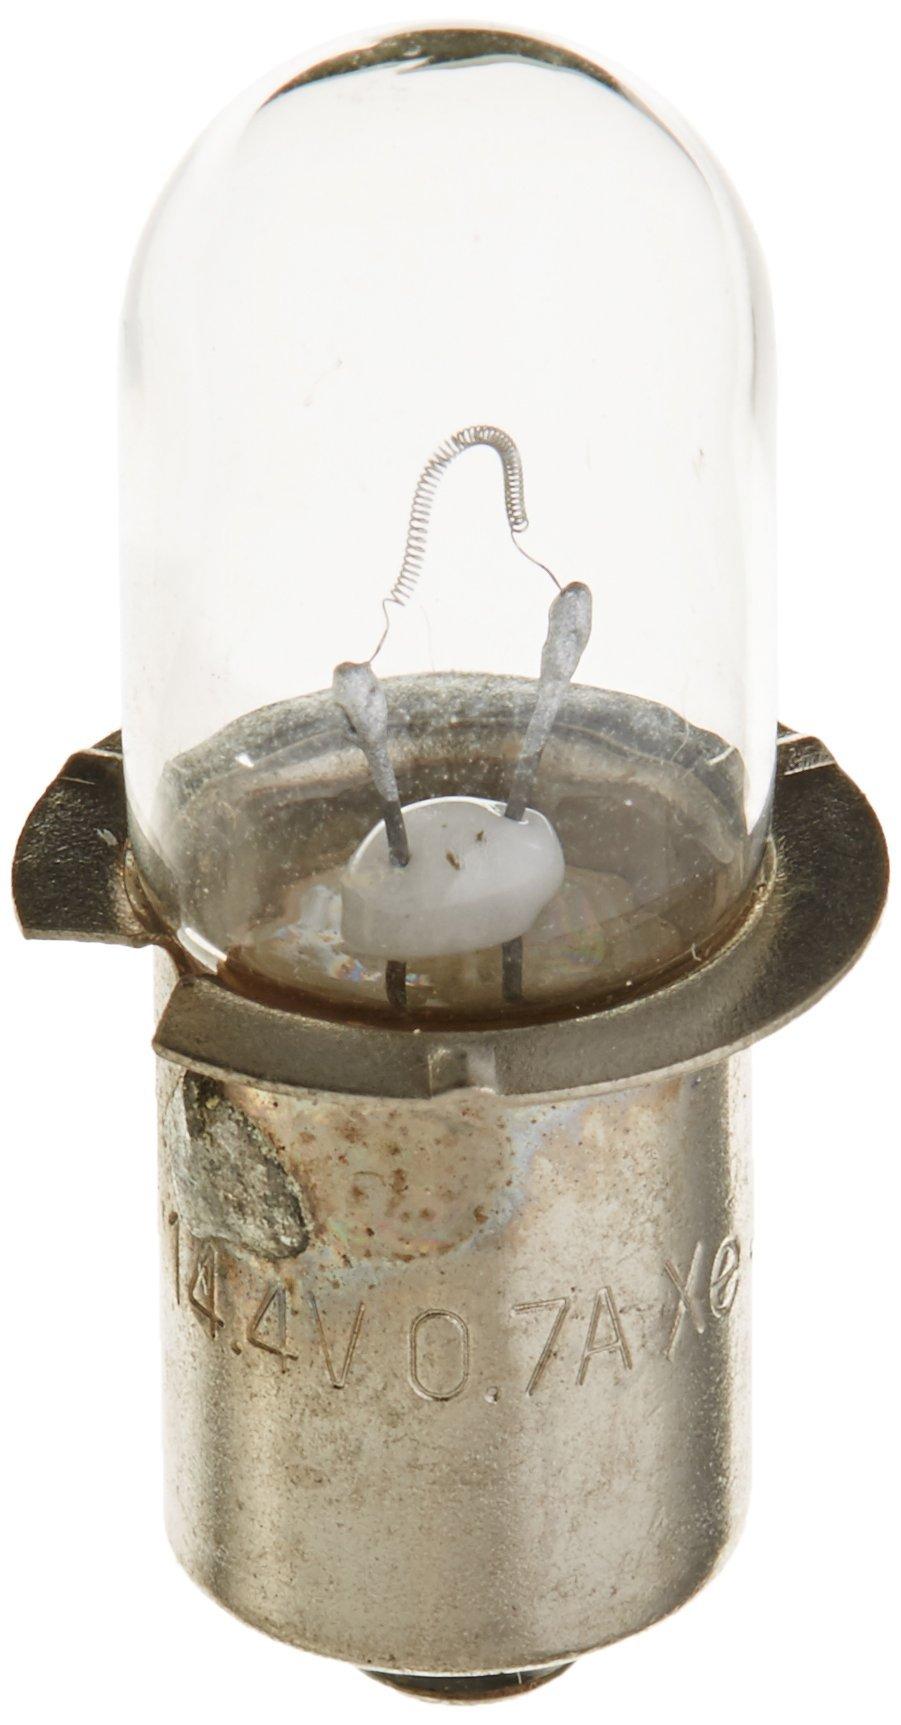 DeWalt DW9063 14.4V Flashlight/Floodlight 300 Lumen Replacement Bulbs (2 Pack)